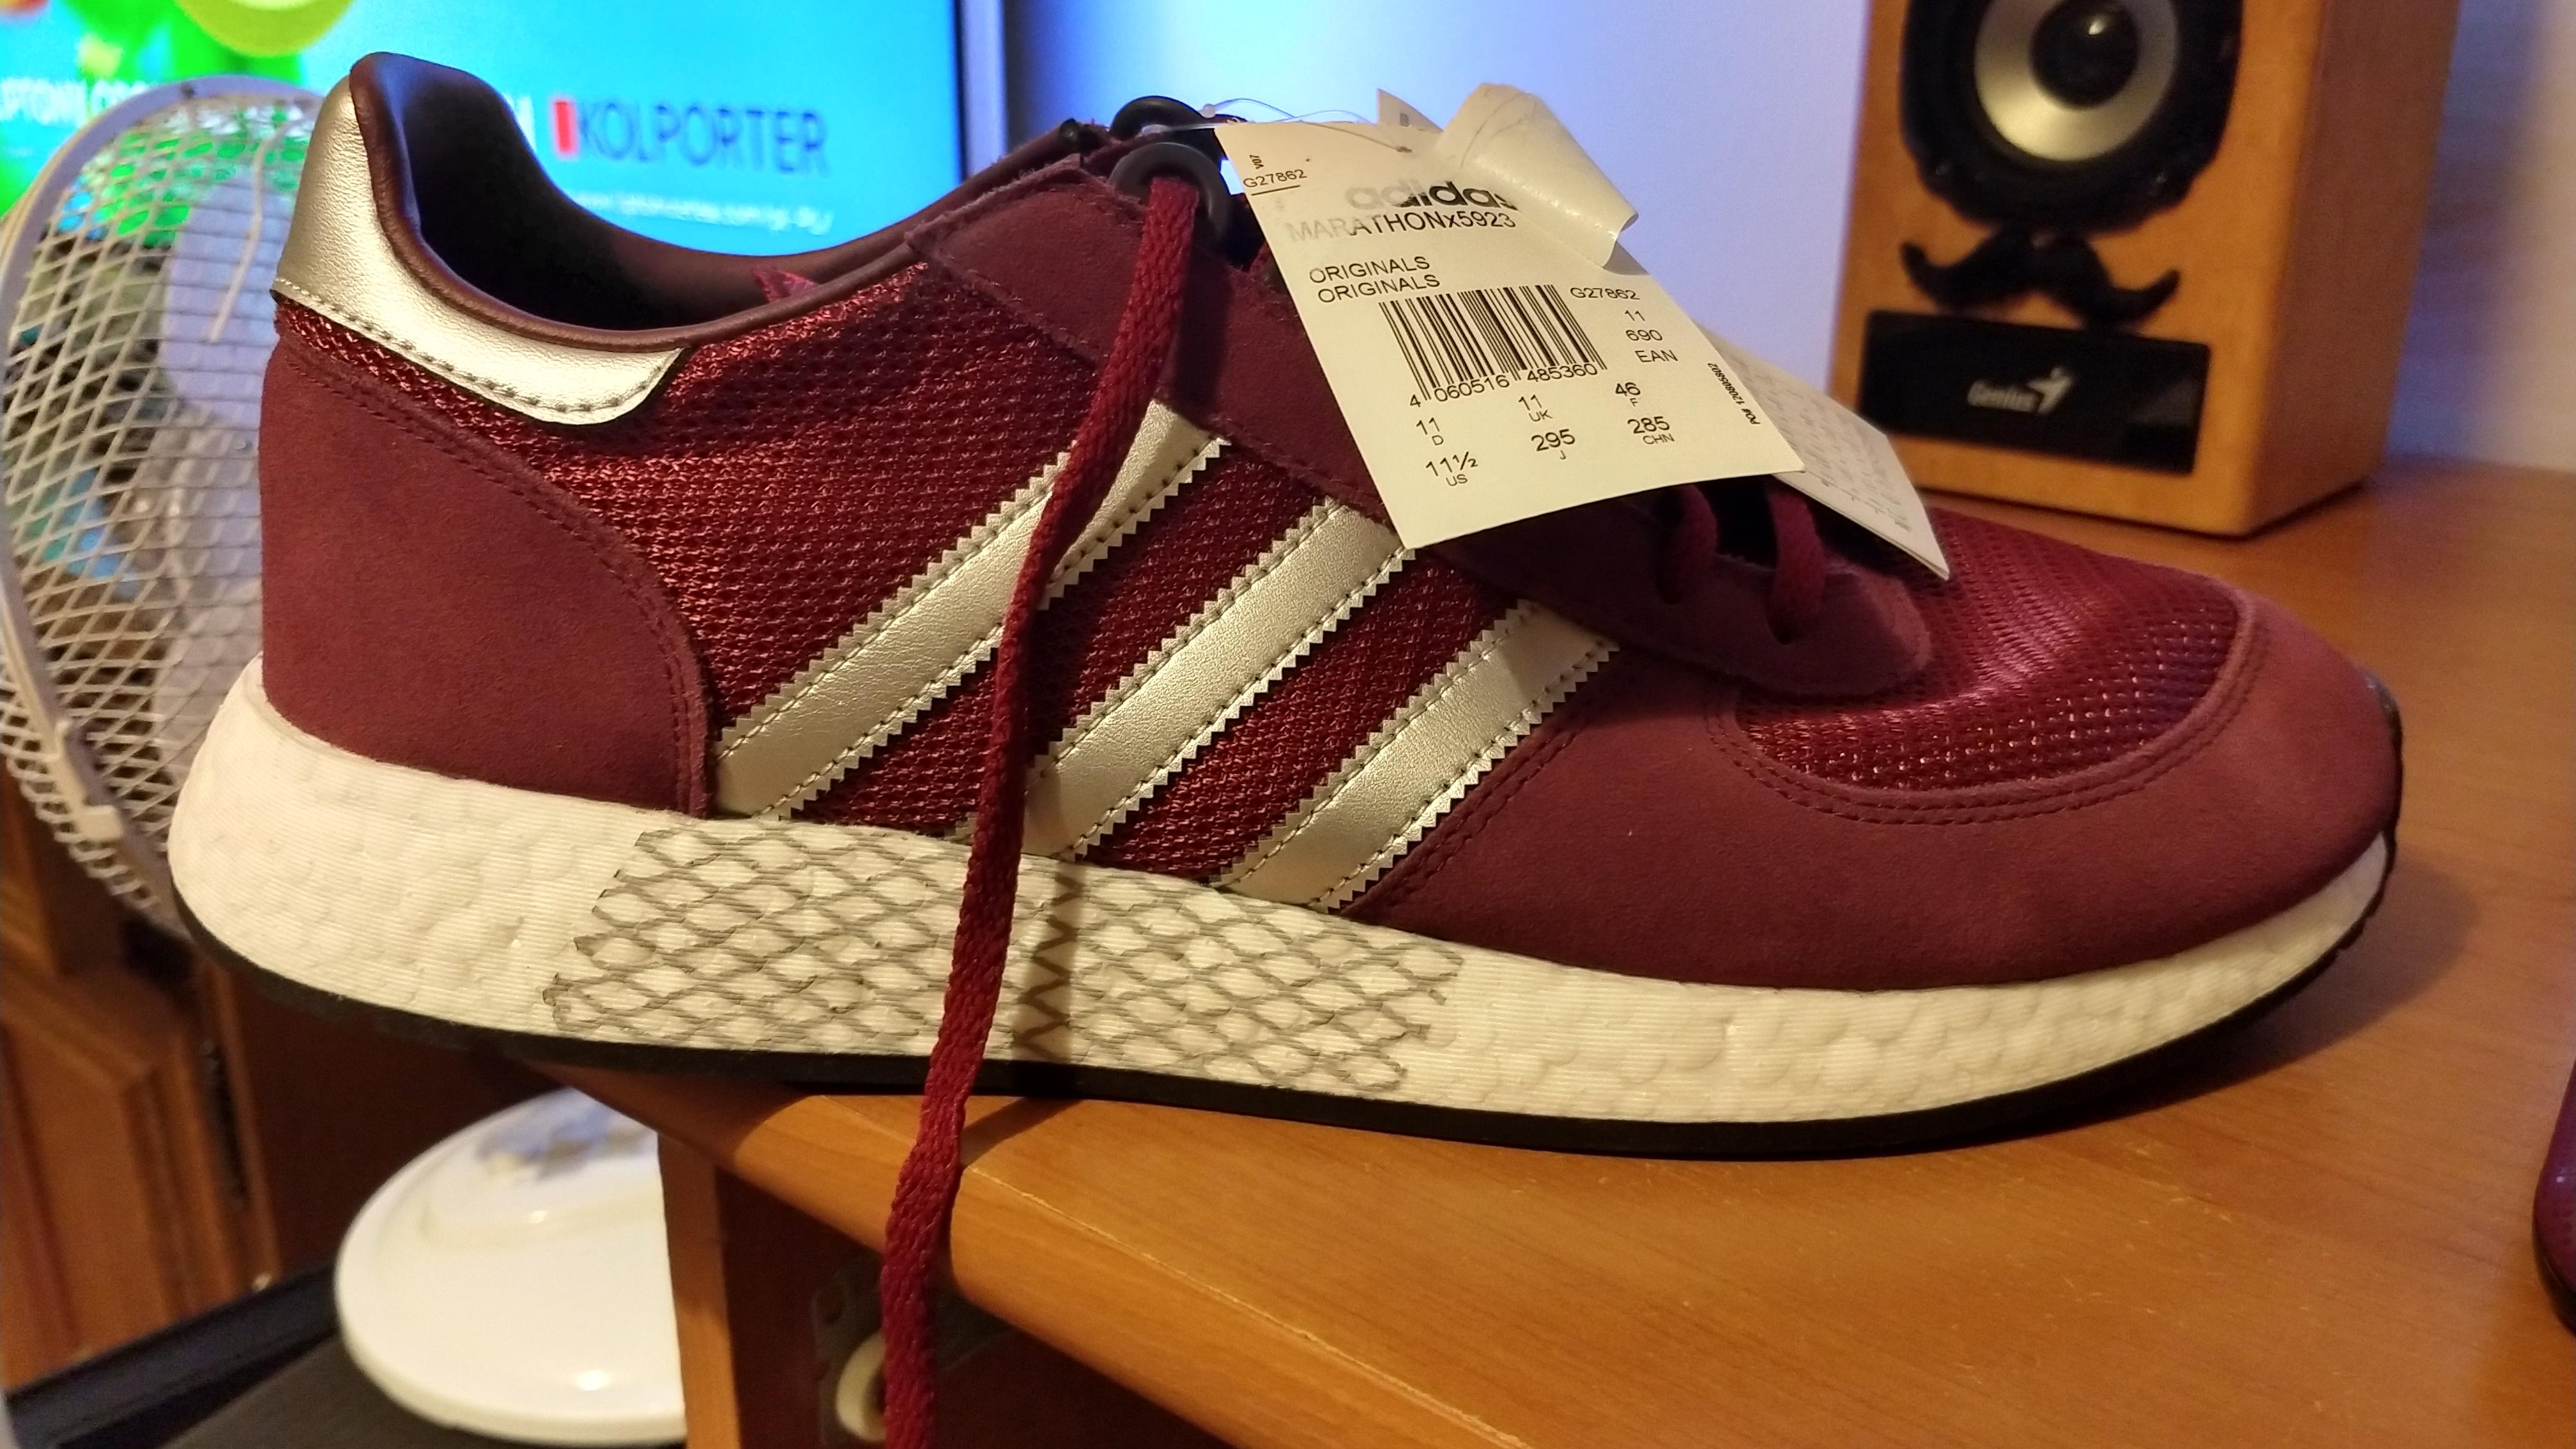 Buty Adidas Marathonx5923 Factory Annopol Warszawa